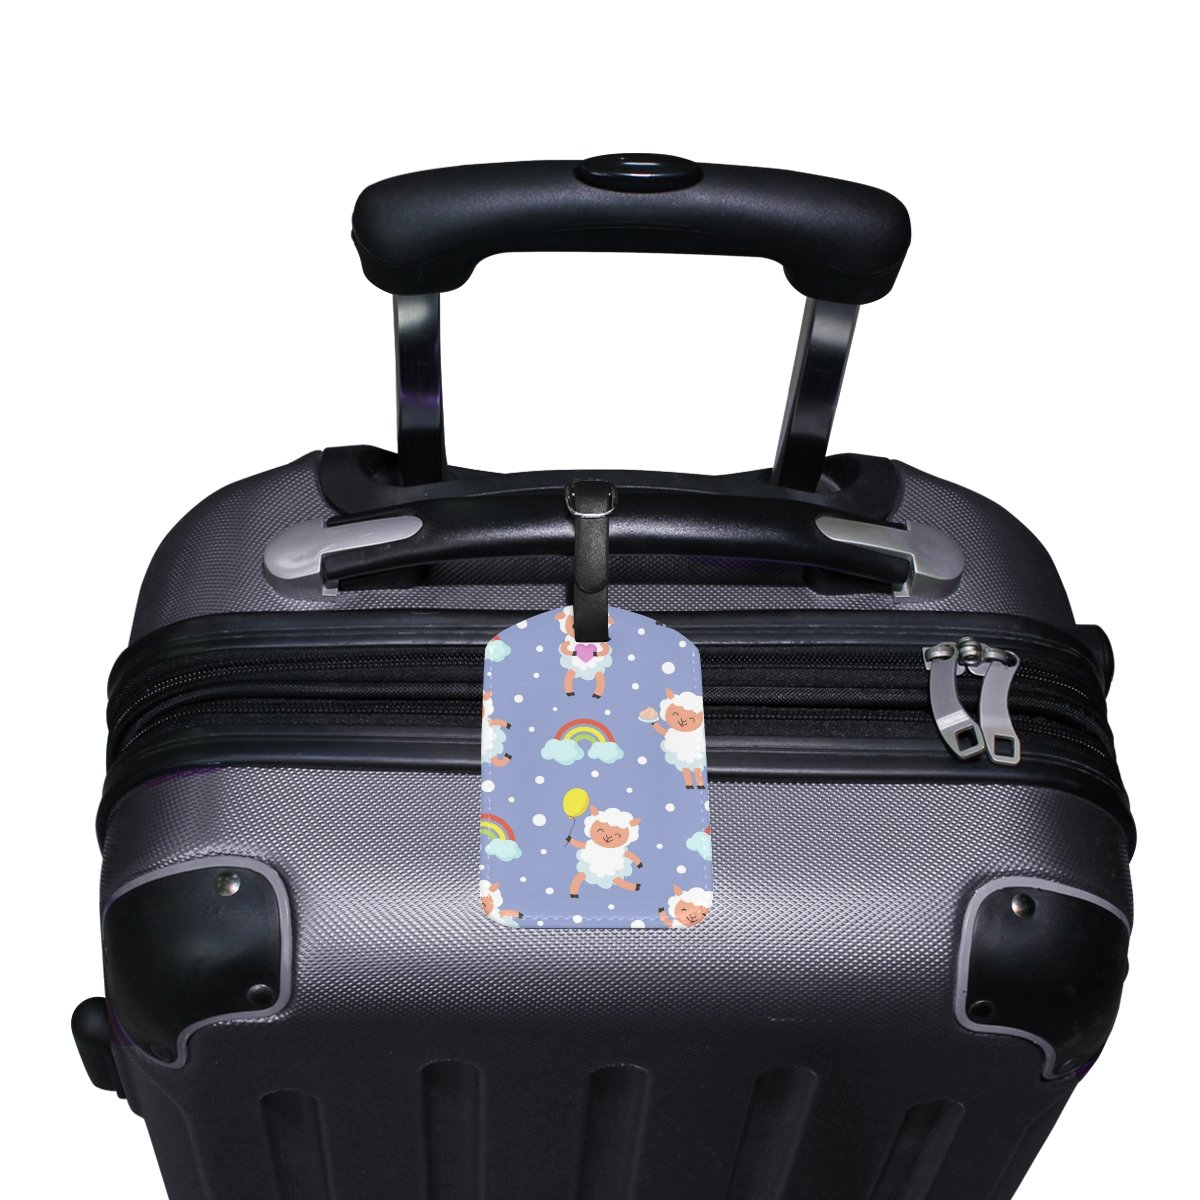 Saobao Travel Luggage Tag White Lamb Small Sheep PU Leather Baggage Travel ID